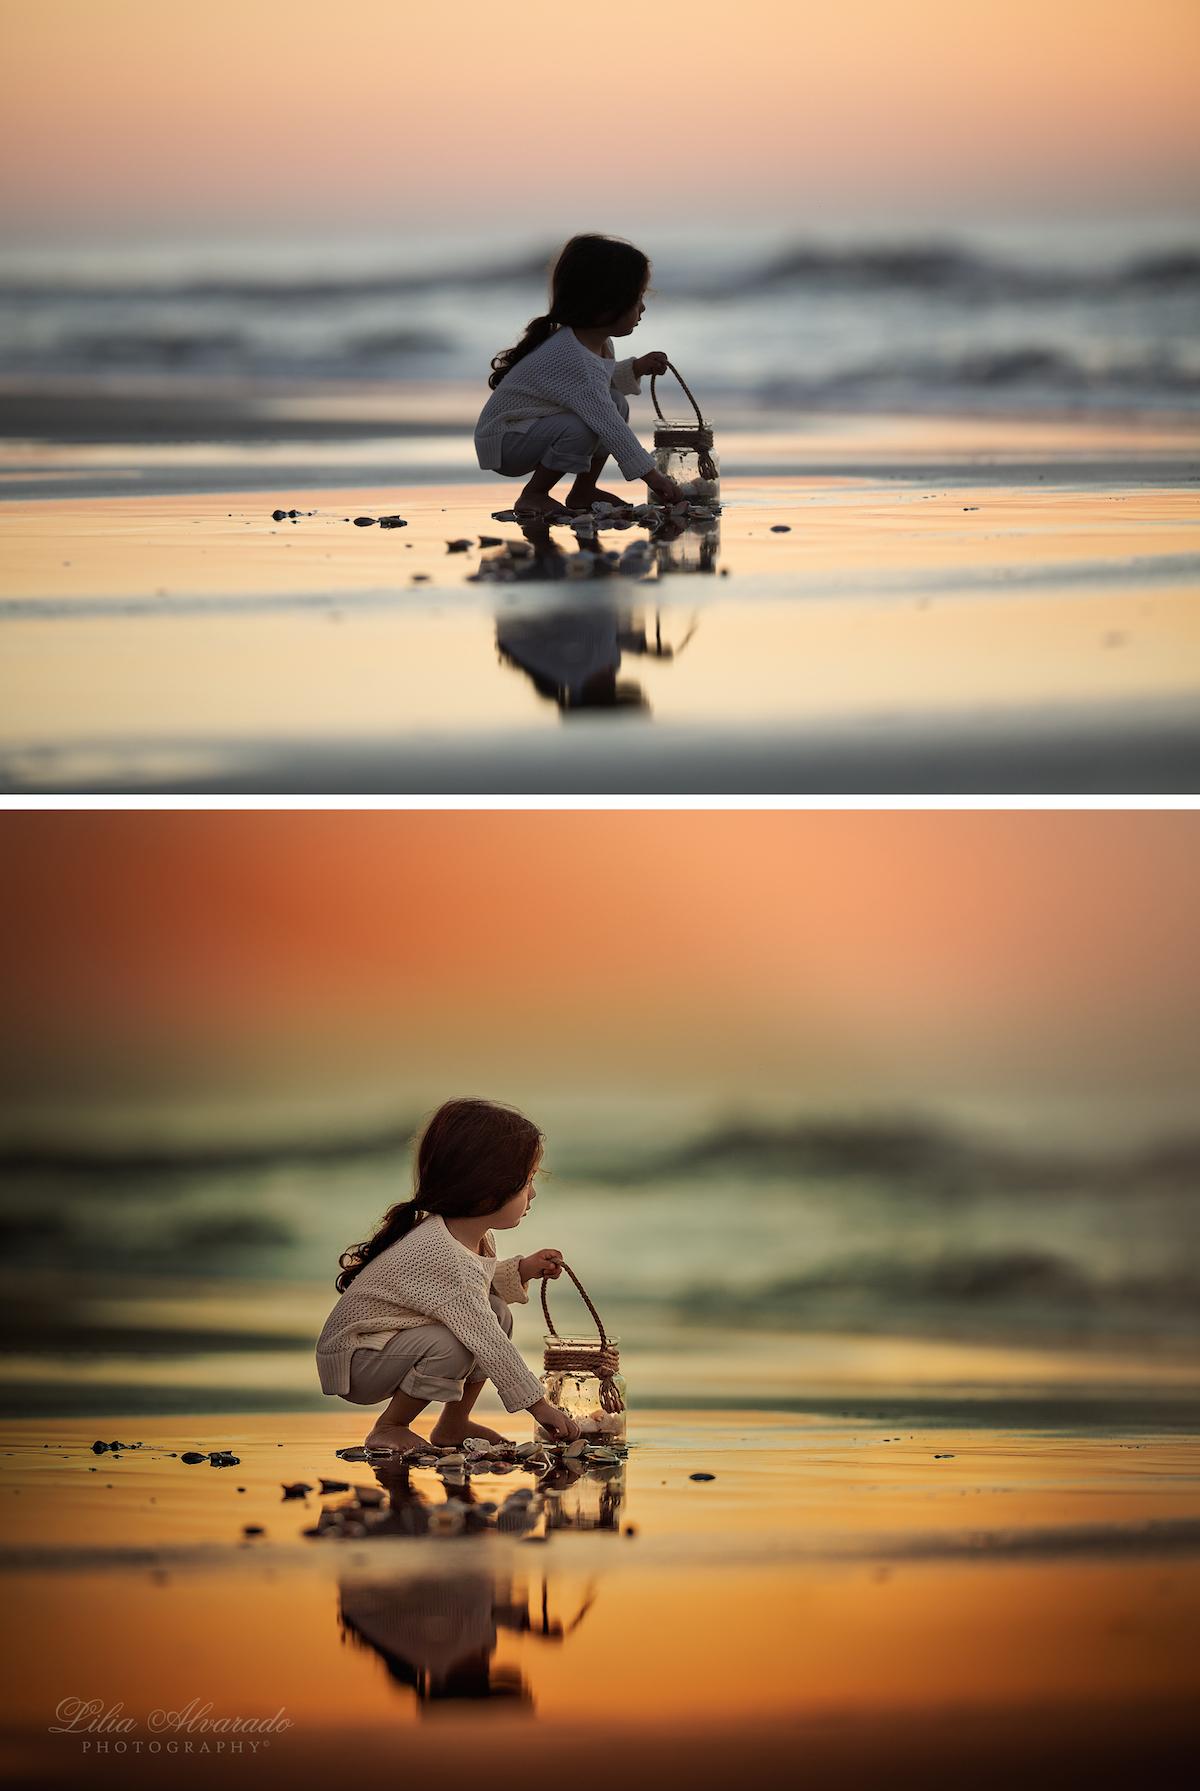 photo manipulation photographer reveals